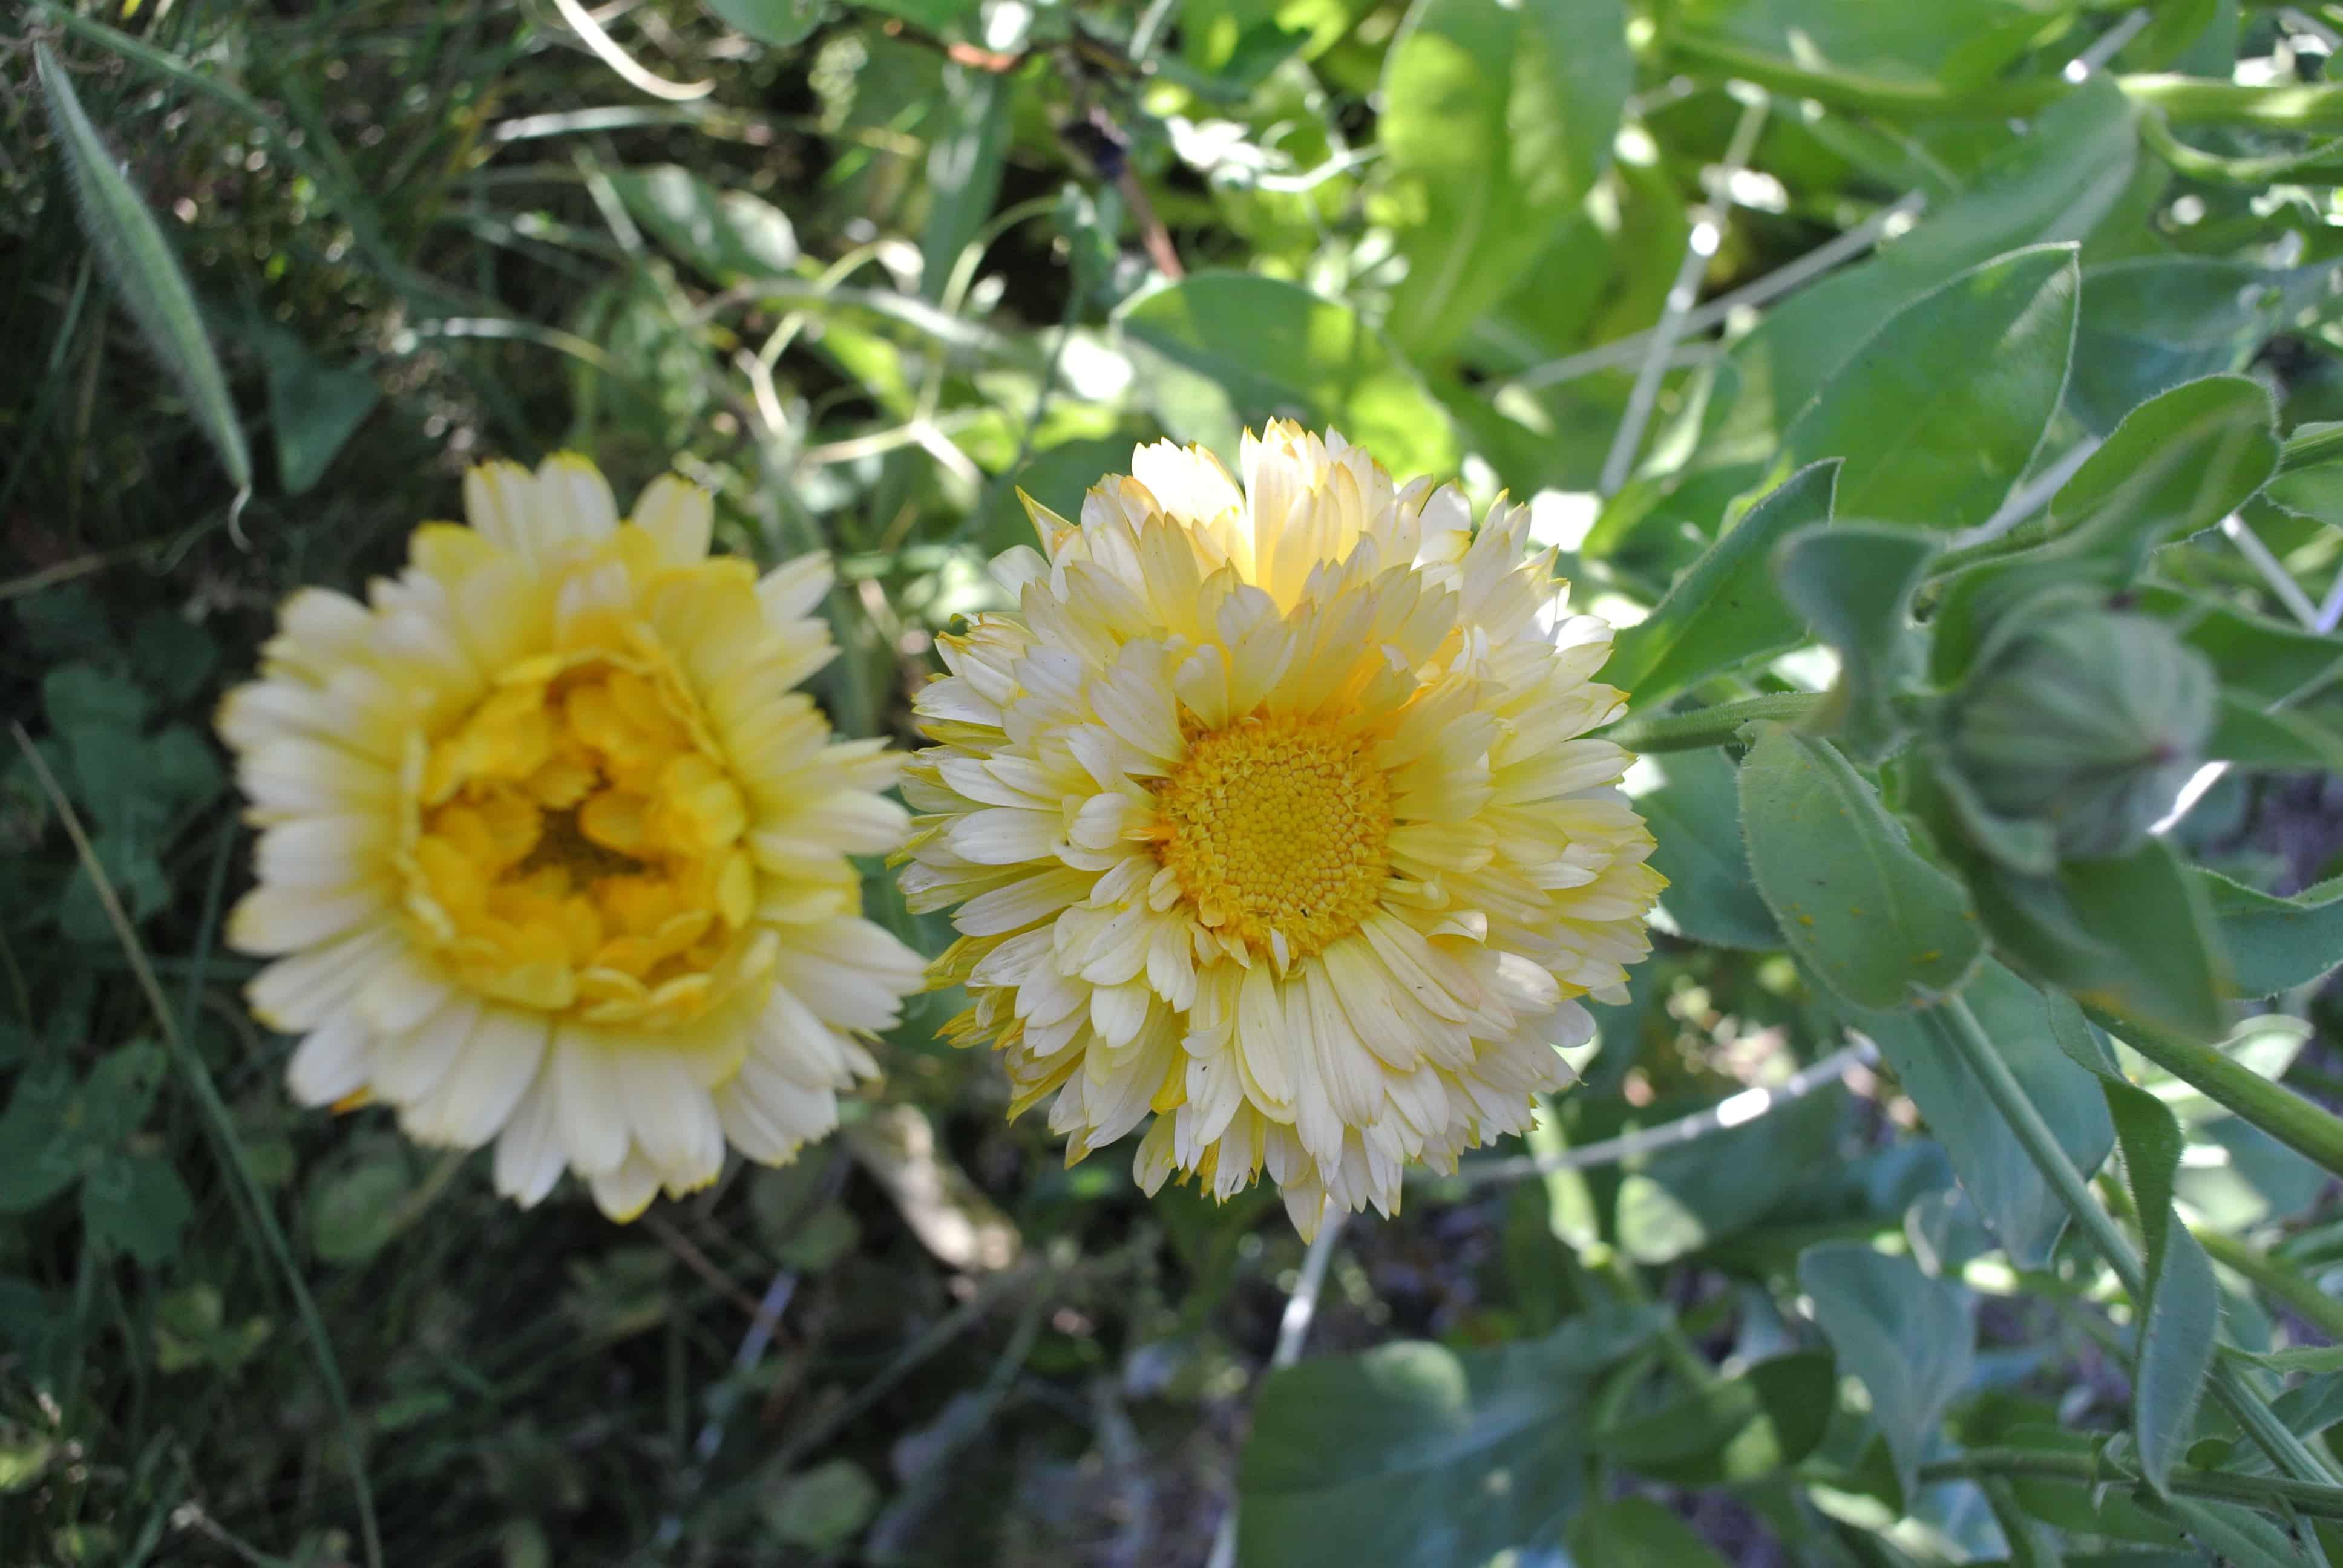 Two yellow calendula flowers in the garden.